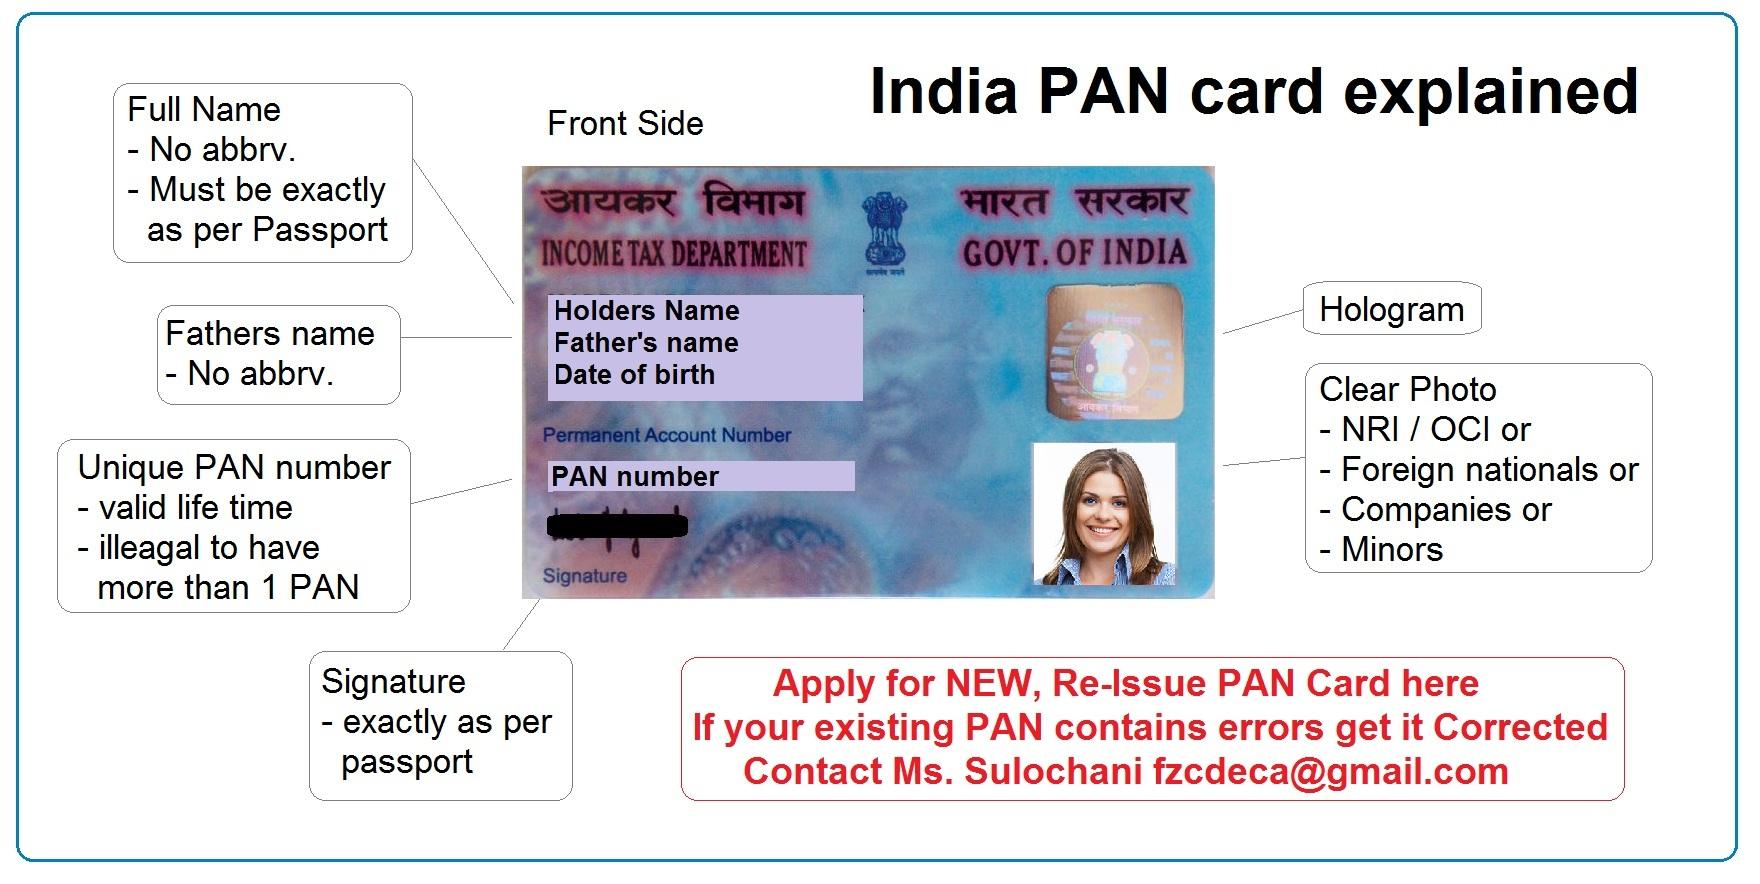 new zealand phone number sample pii_pn_d605b5bc7de5d17c413e